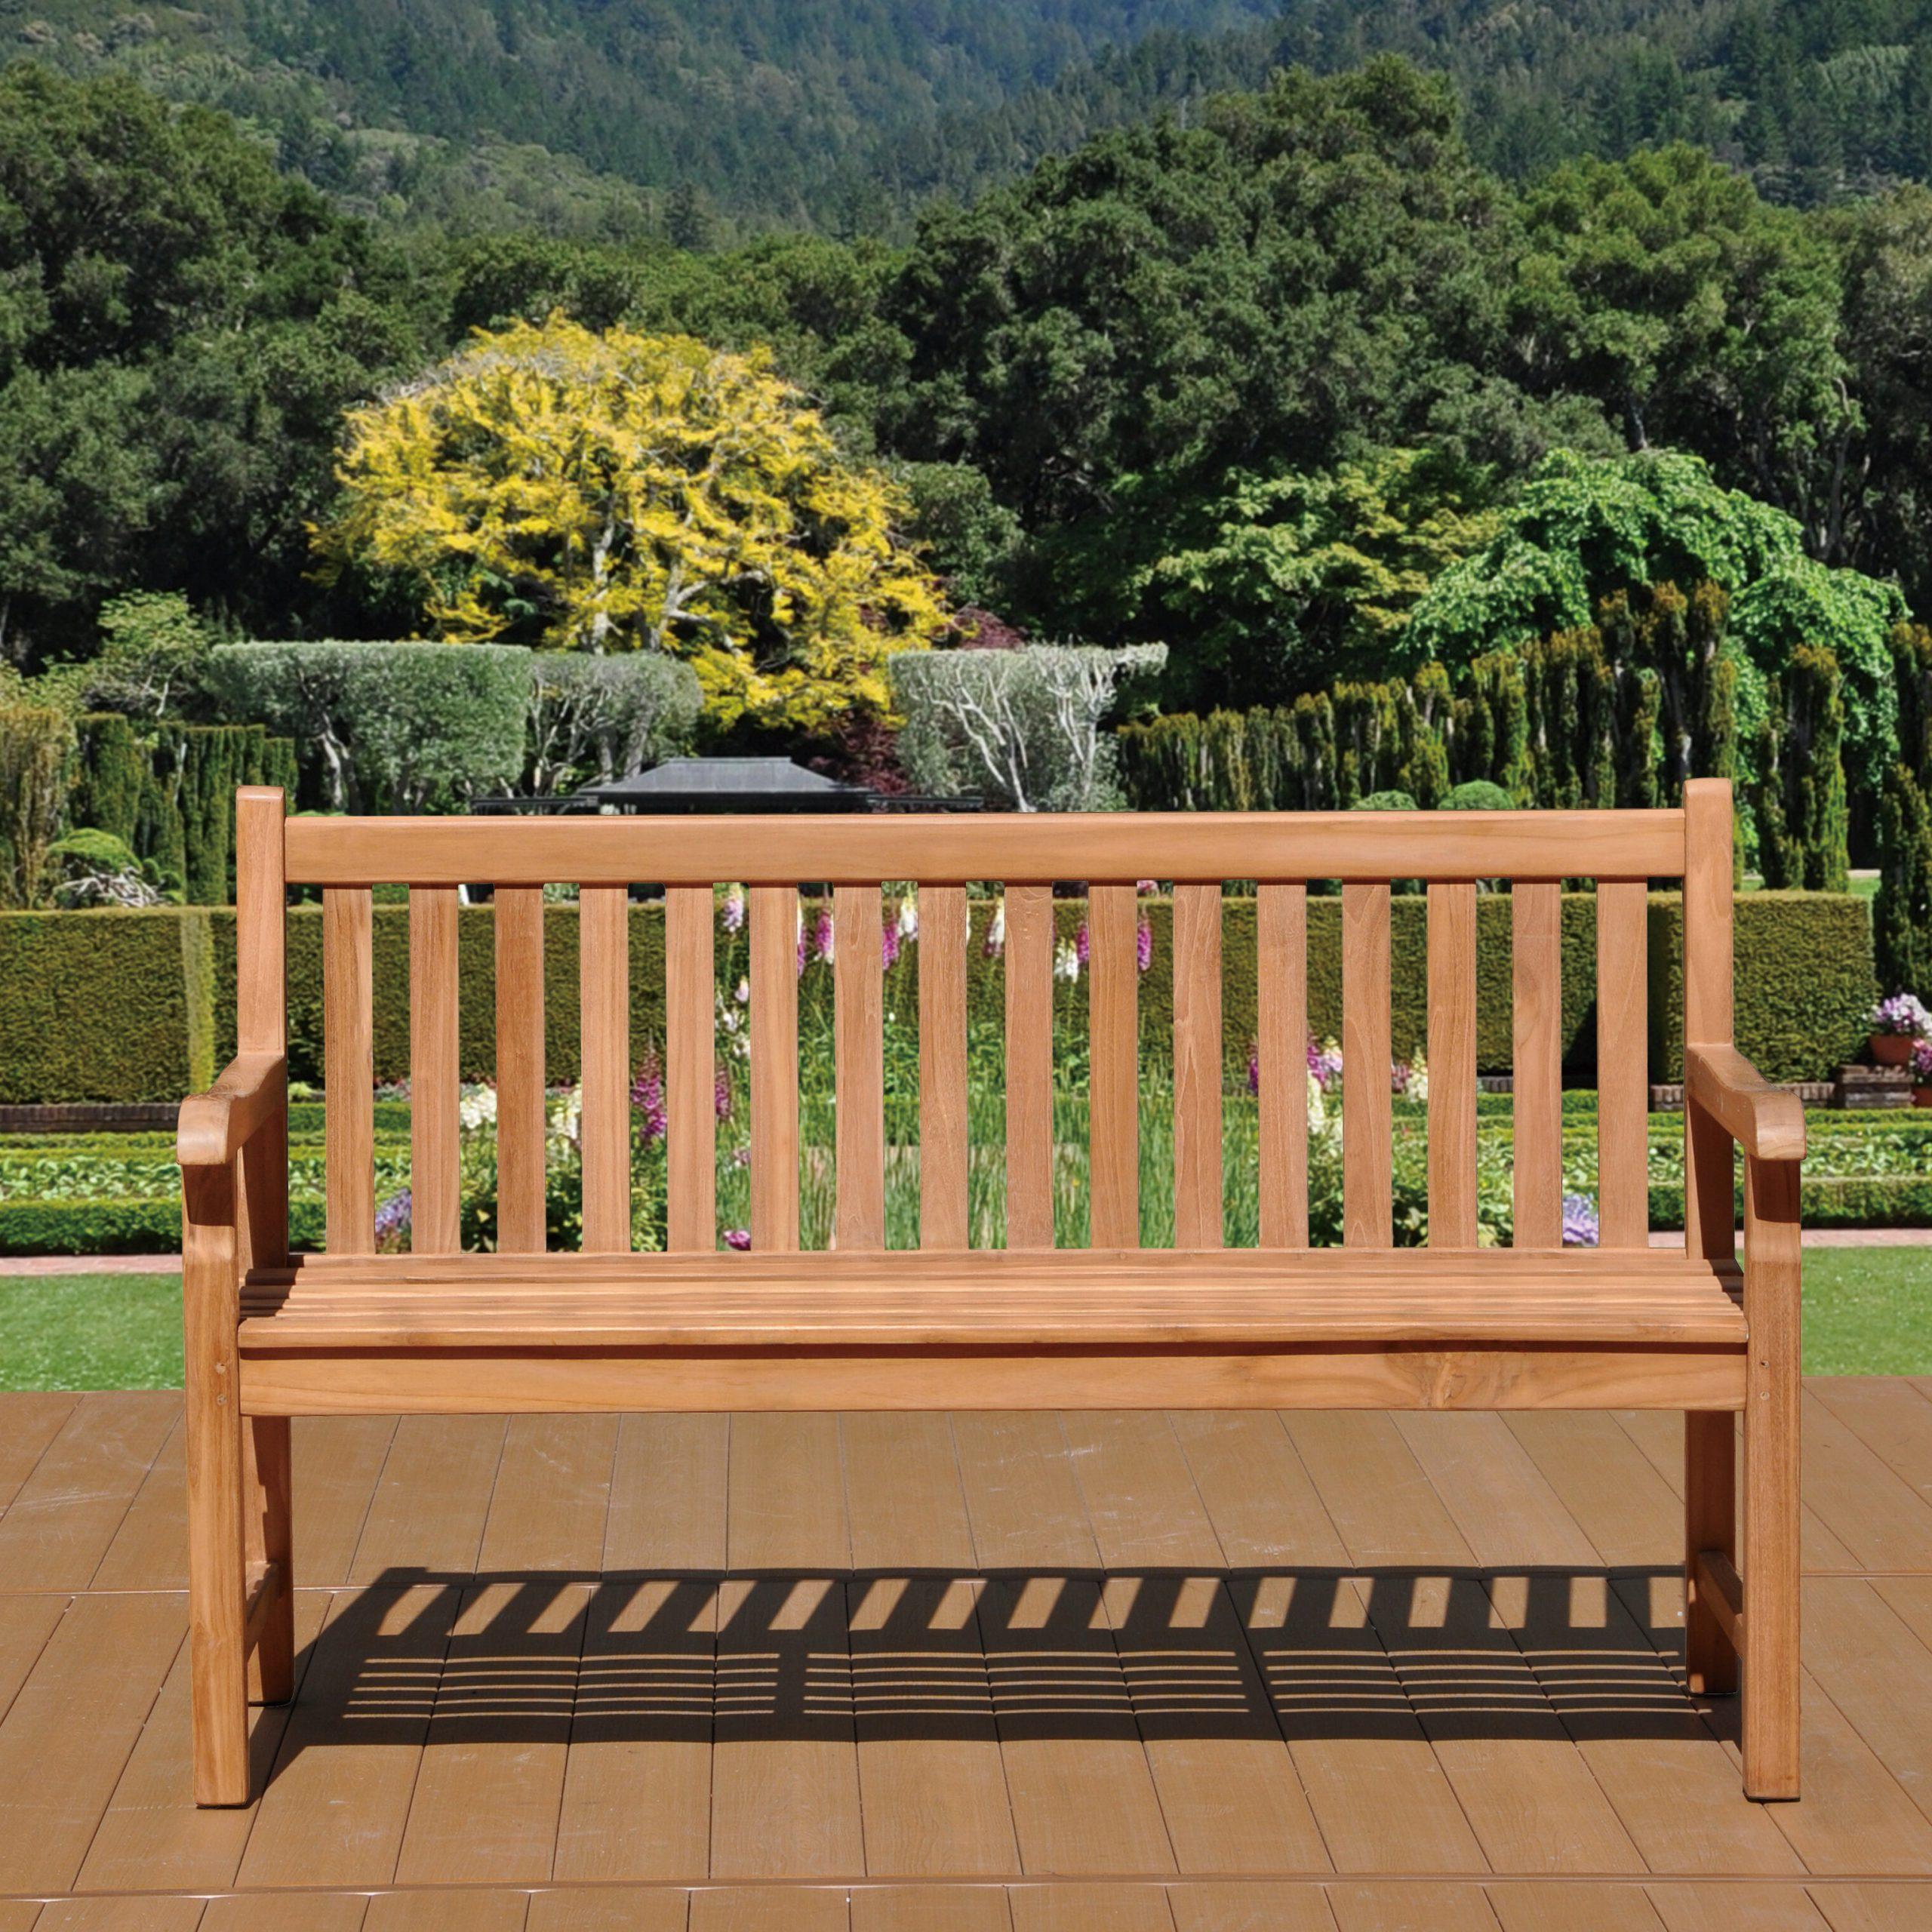 Fashionable Ruckus Teak Garden Bench Pertaining To Harpersfield Wooden Garden Benches (View 15 of 30)